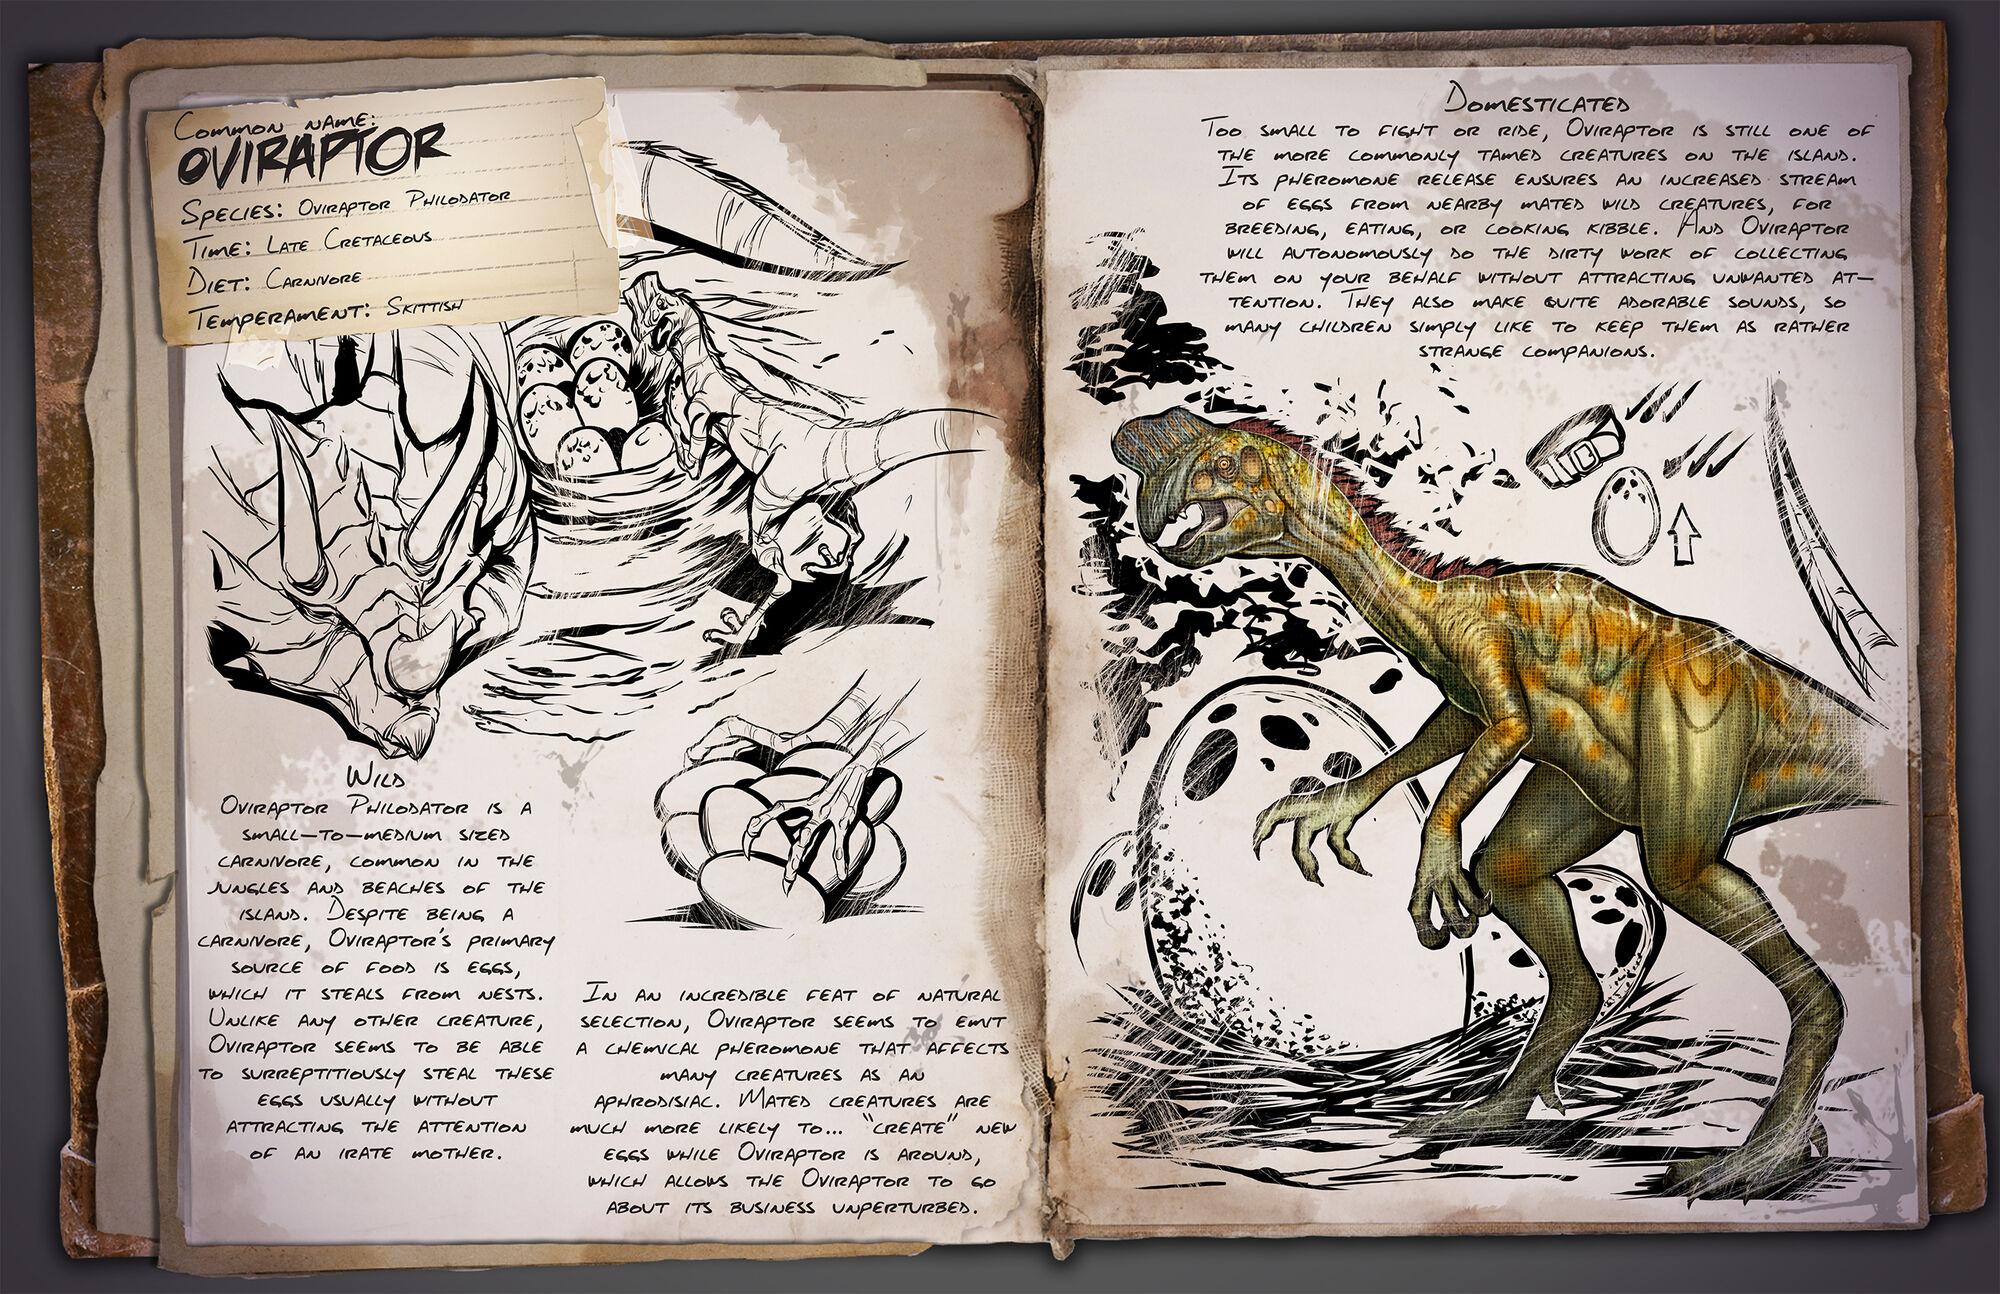 Oviraptor | ARK: Survival Evolved Wiki | FANDOM powered by Wikia